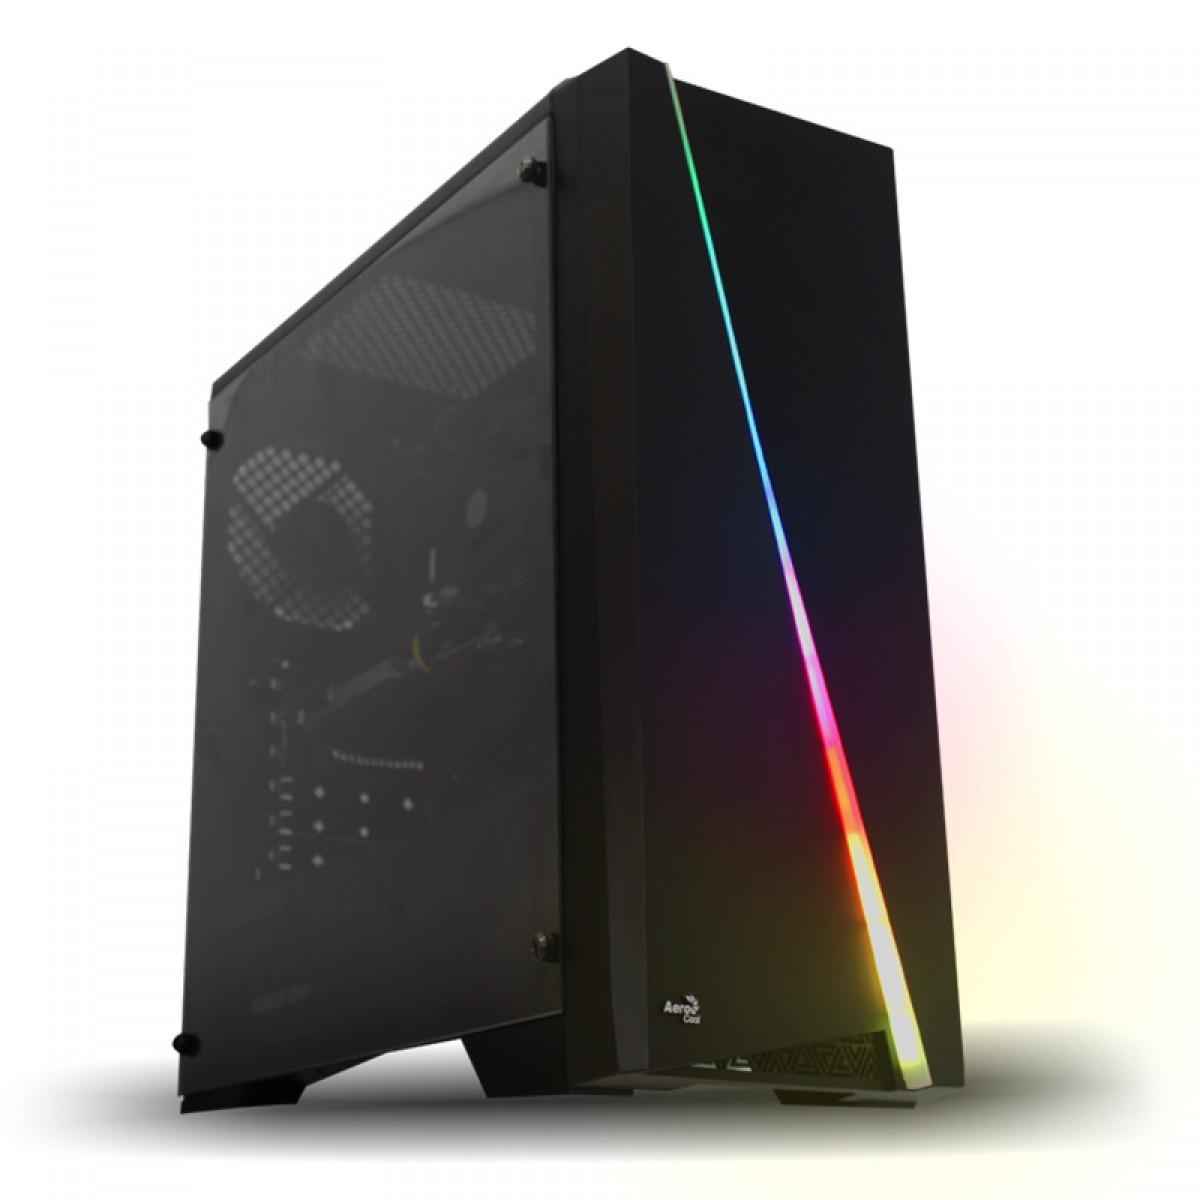 Pc Gamer T-Power Warlord Lvl-5 AMD Ryzen 7 3700X / GeForce RTX 2080 Super / DDR4 16GB / HD 1TB / 600W